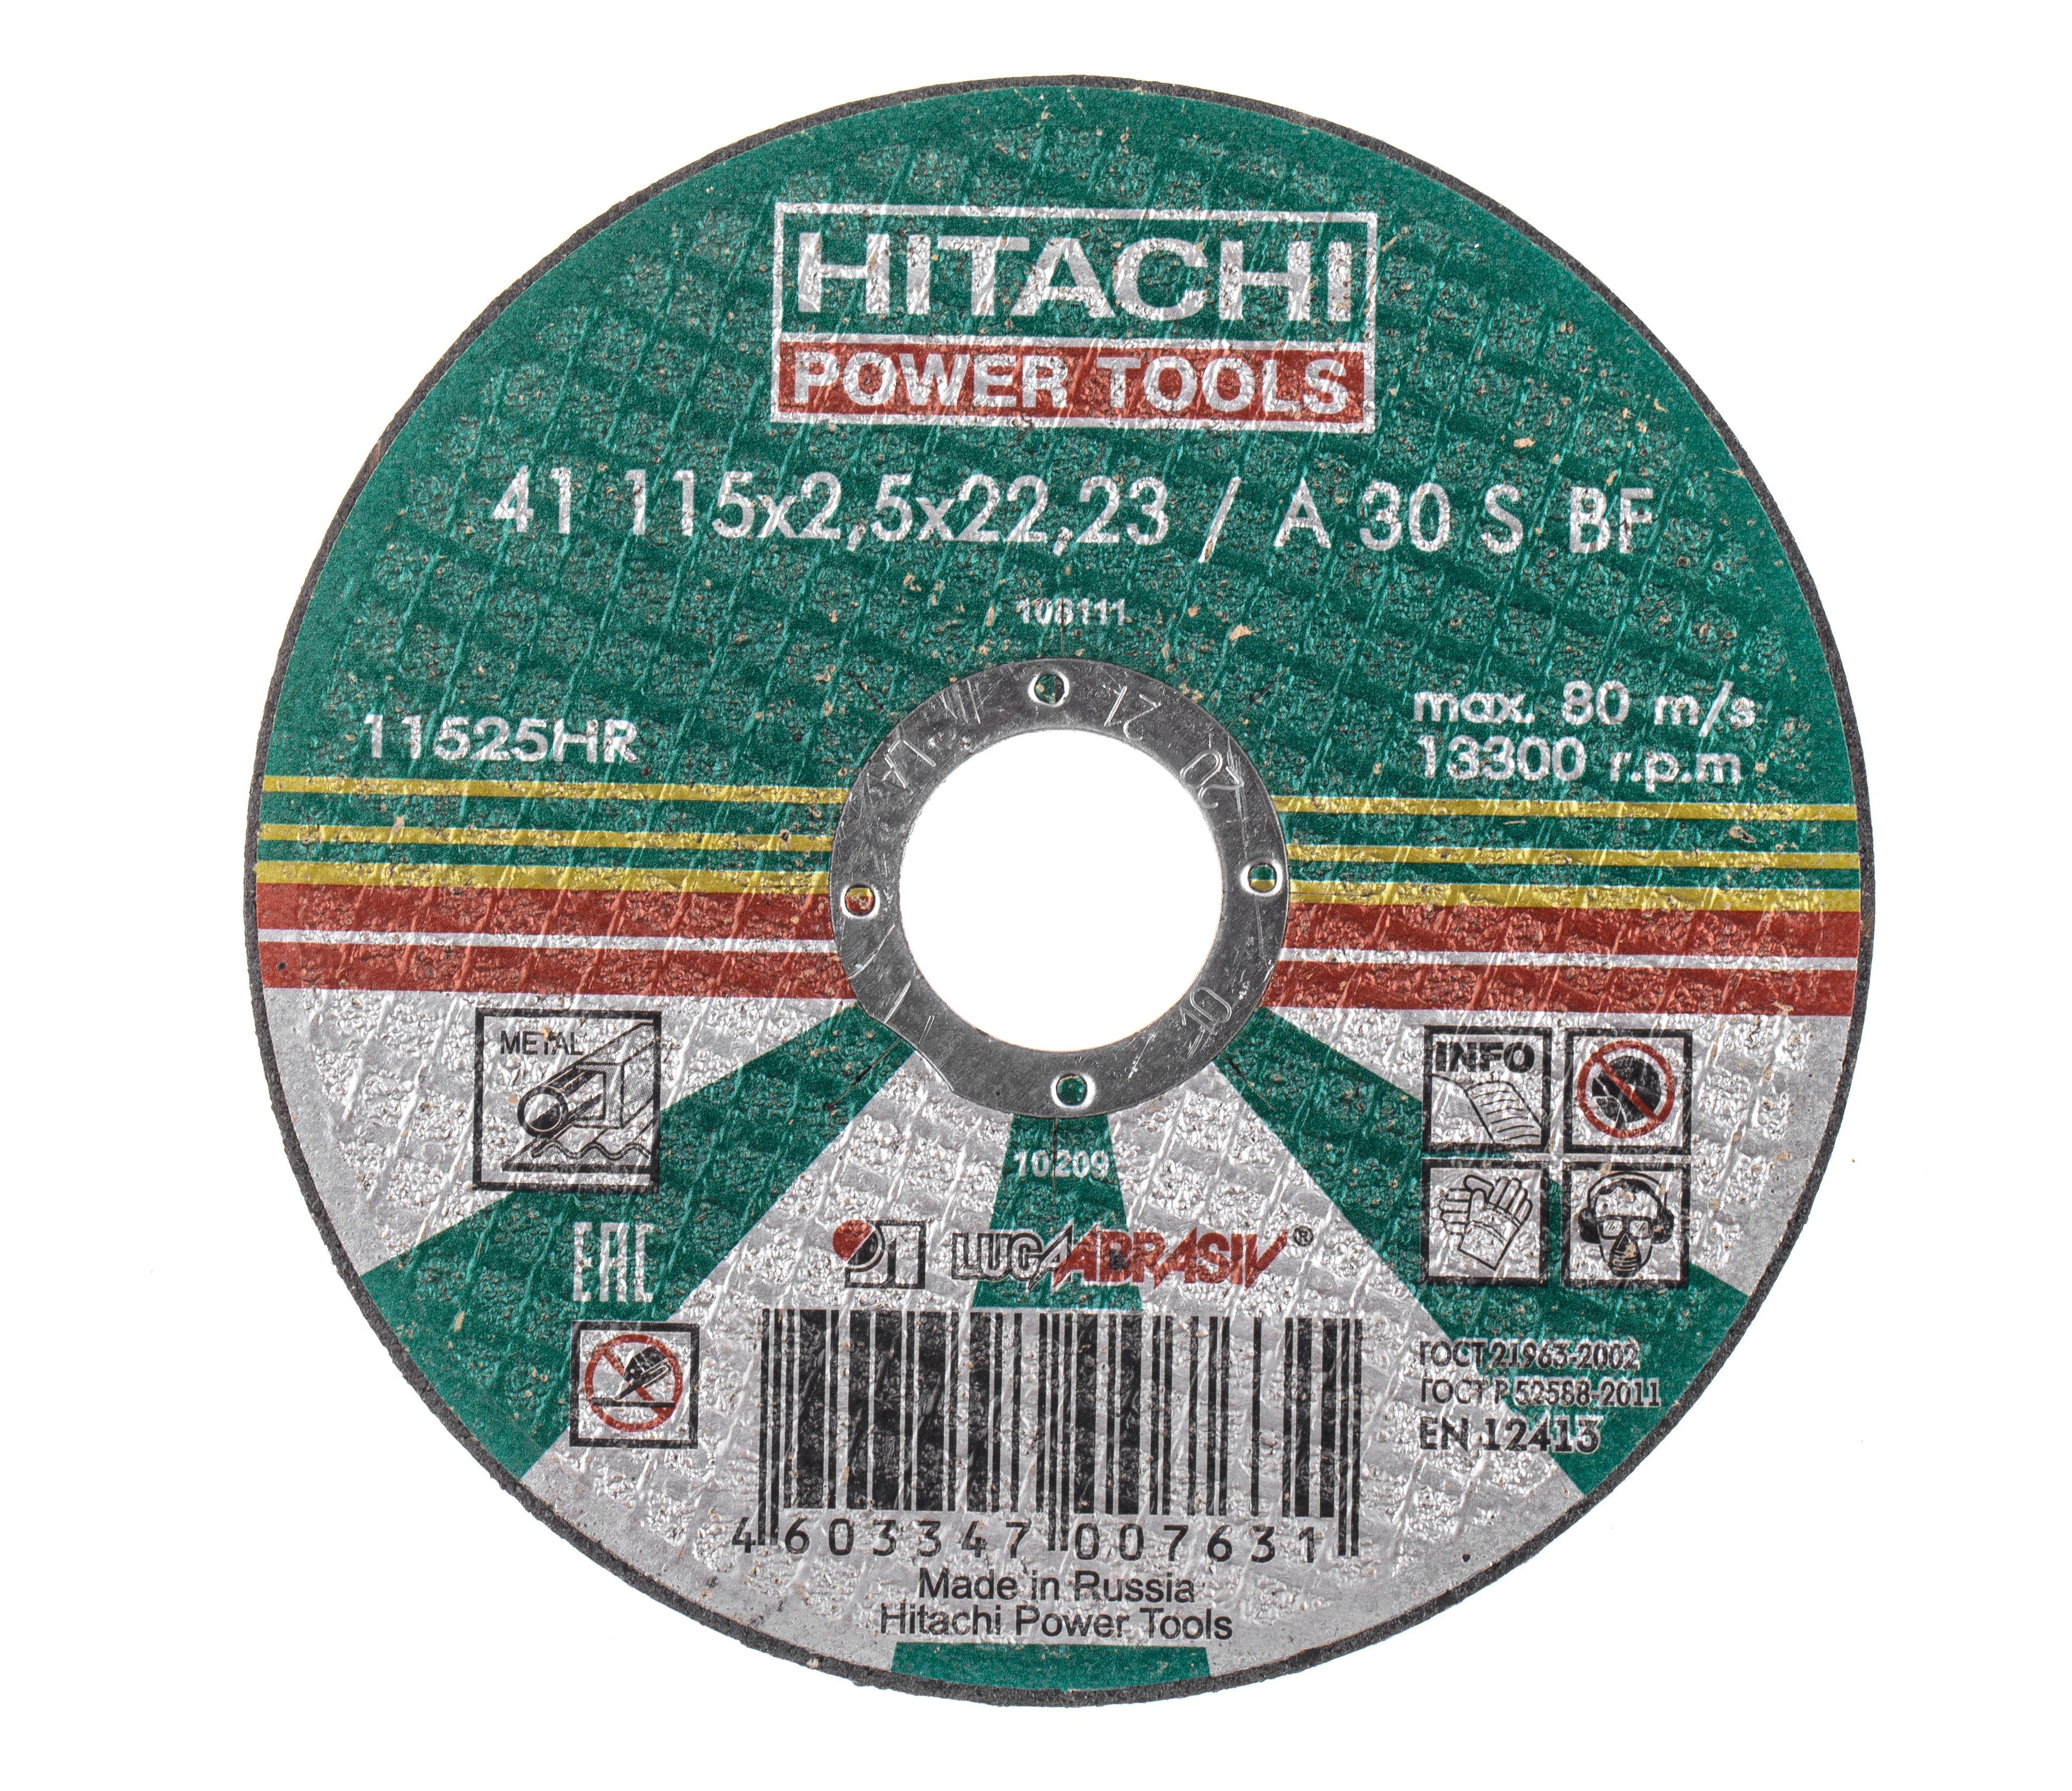 Круг отрезной Hitachi А24 115 Х 2,5 Х 22 по металлу 25шт круг отрезной hammer 150 x 2 0 x 22 по металлу коробка 200шт